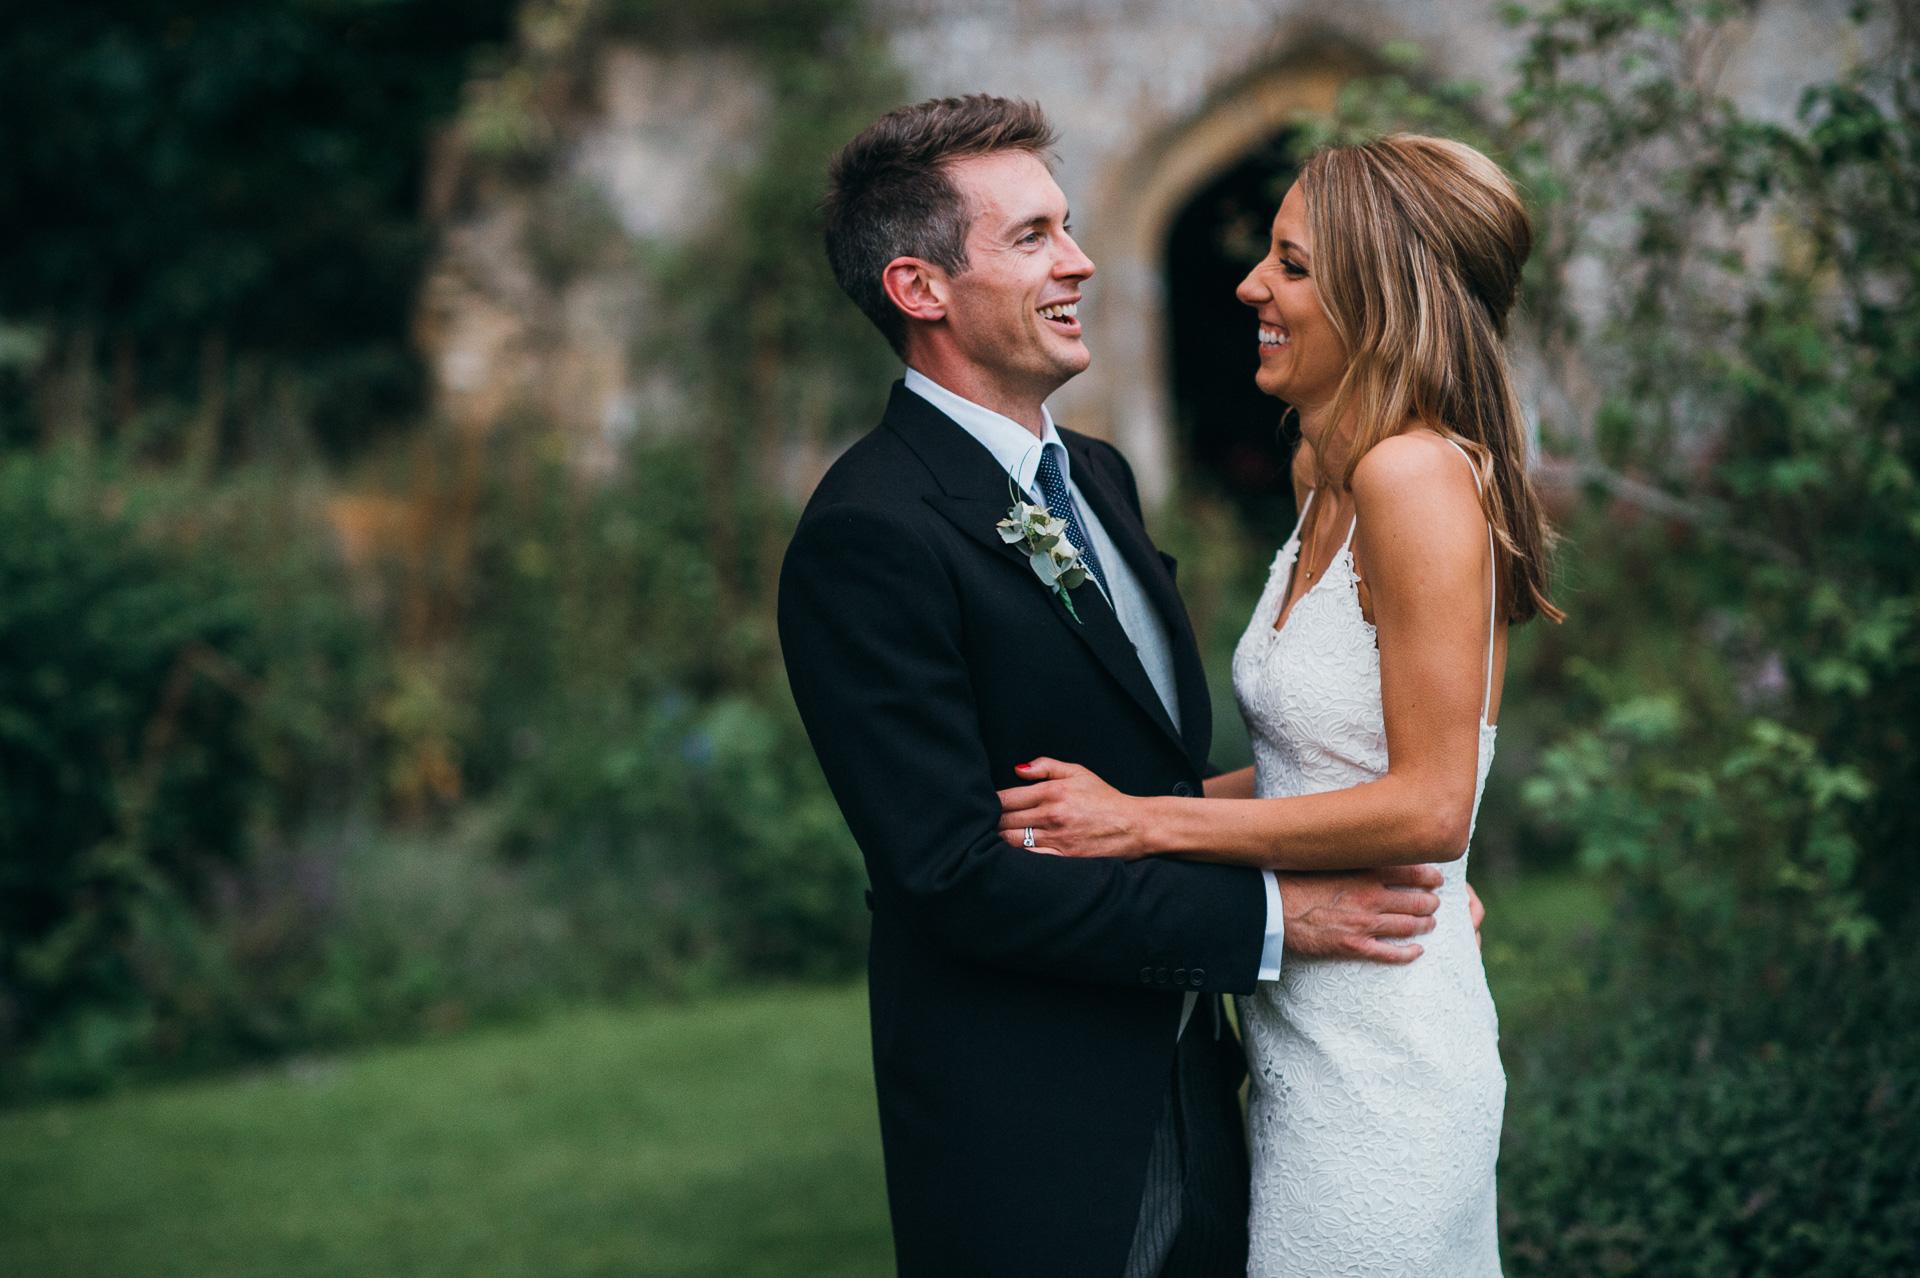 newlyweds Sudeley castle wedding photography